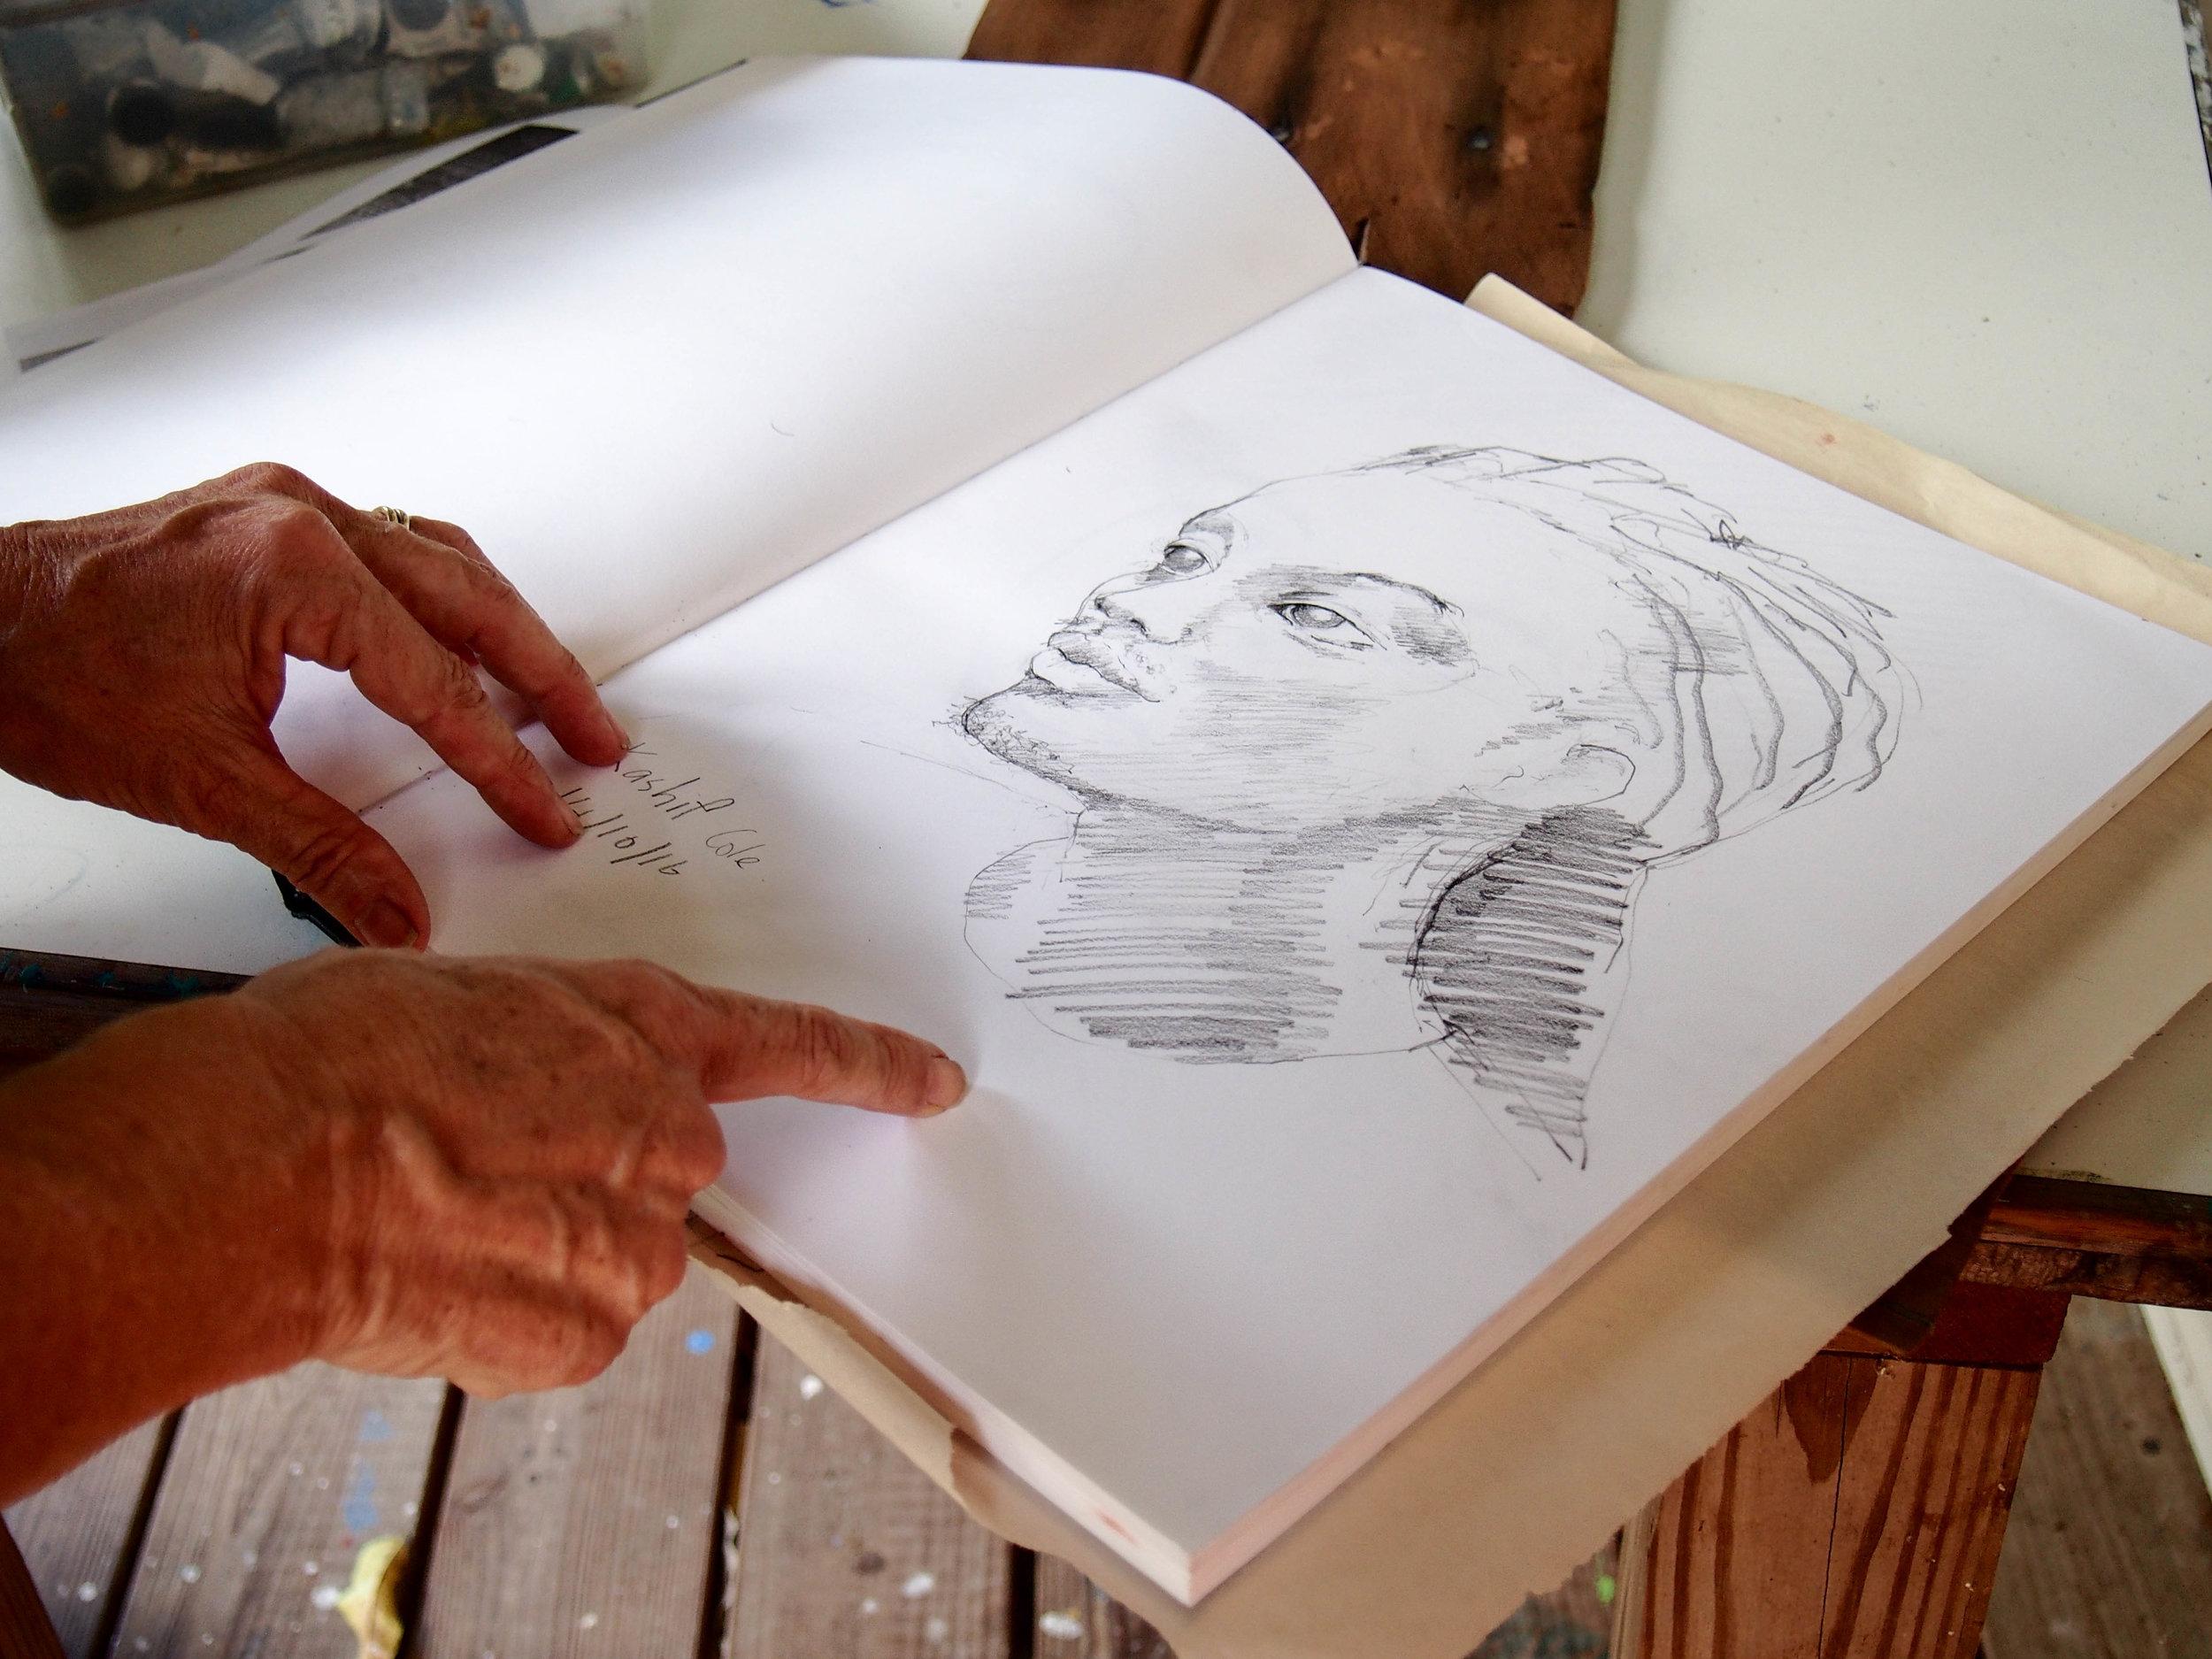 Inside Sallie's sketchbook. Photo by Jennie Ritchie.